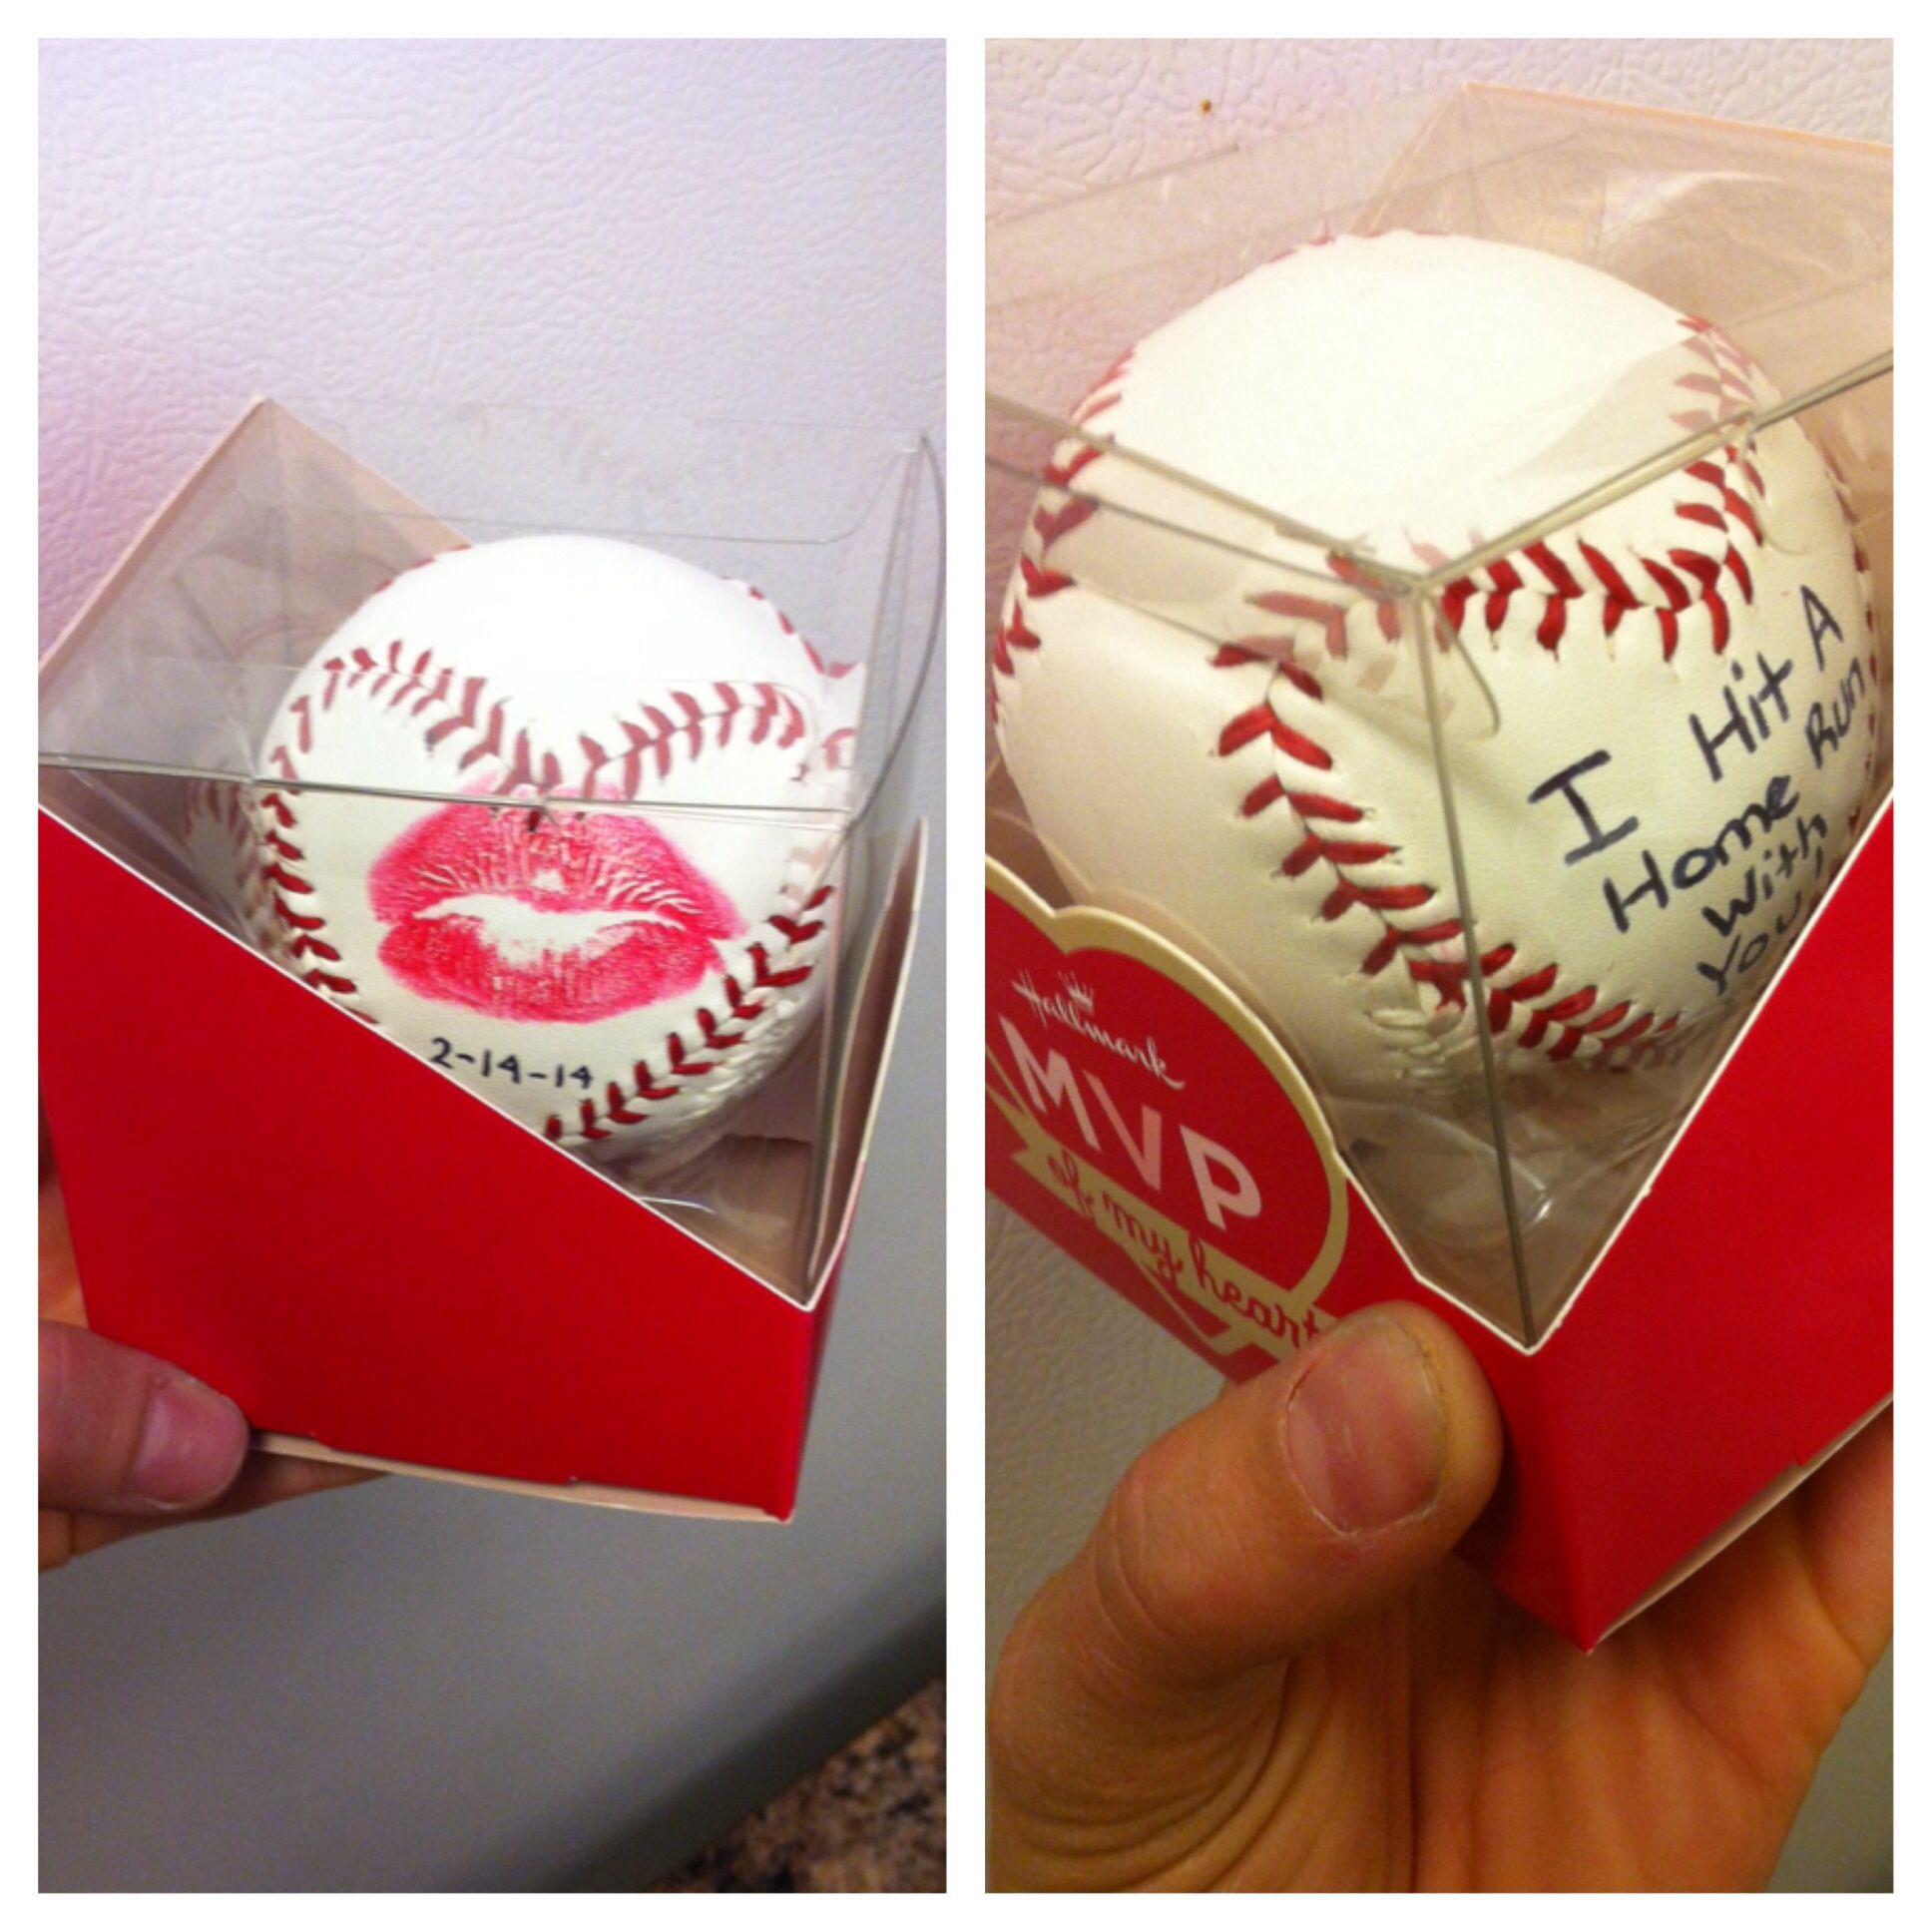 Gift idea baseball boyfriend kamrynwofford – What to Write on a Valentines Card for Your Boyfriend